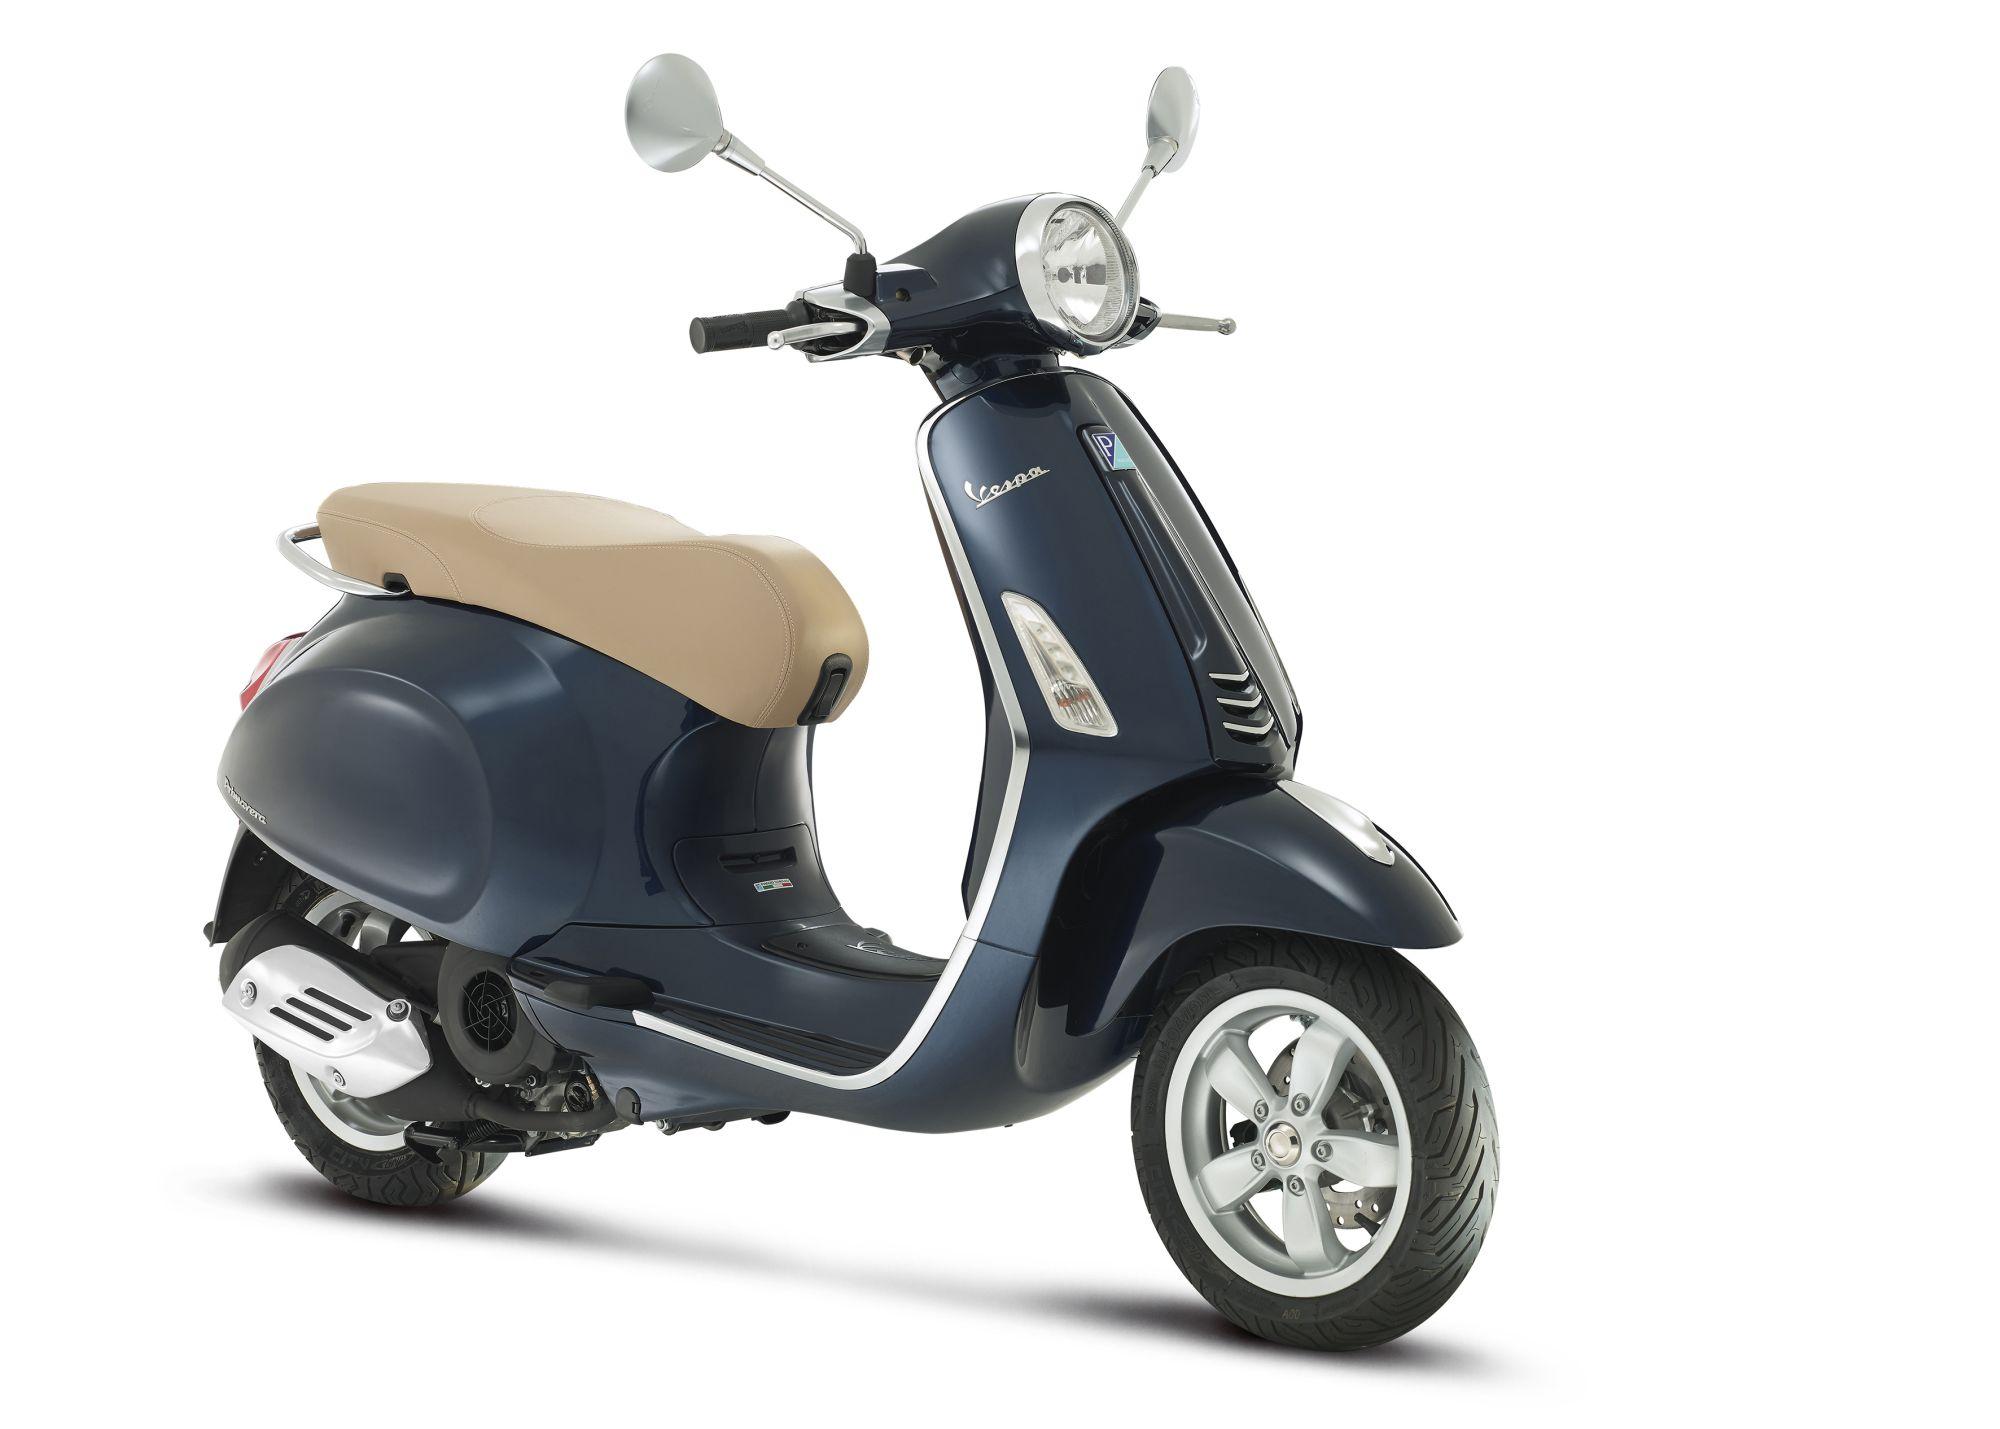 vespa modelle motorrad imdahl motorger te gmbh 52353. Black Bedroom Furniture Sets. Home Design Ideas